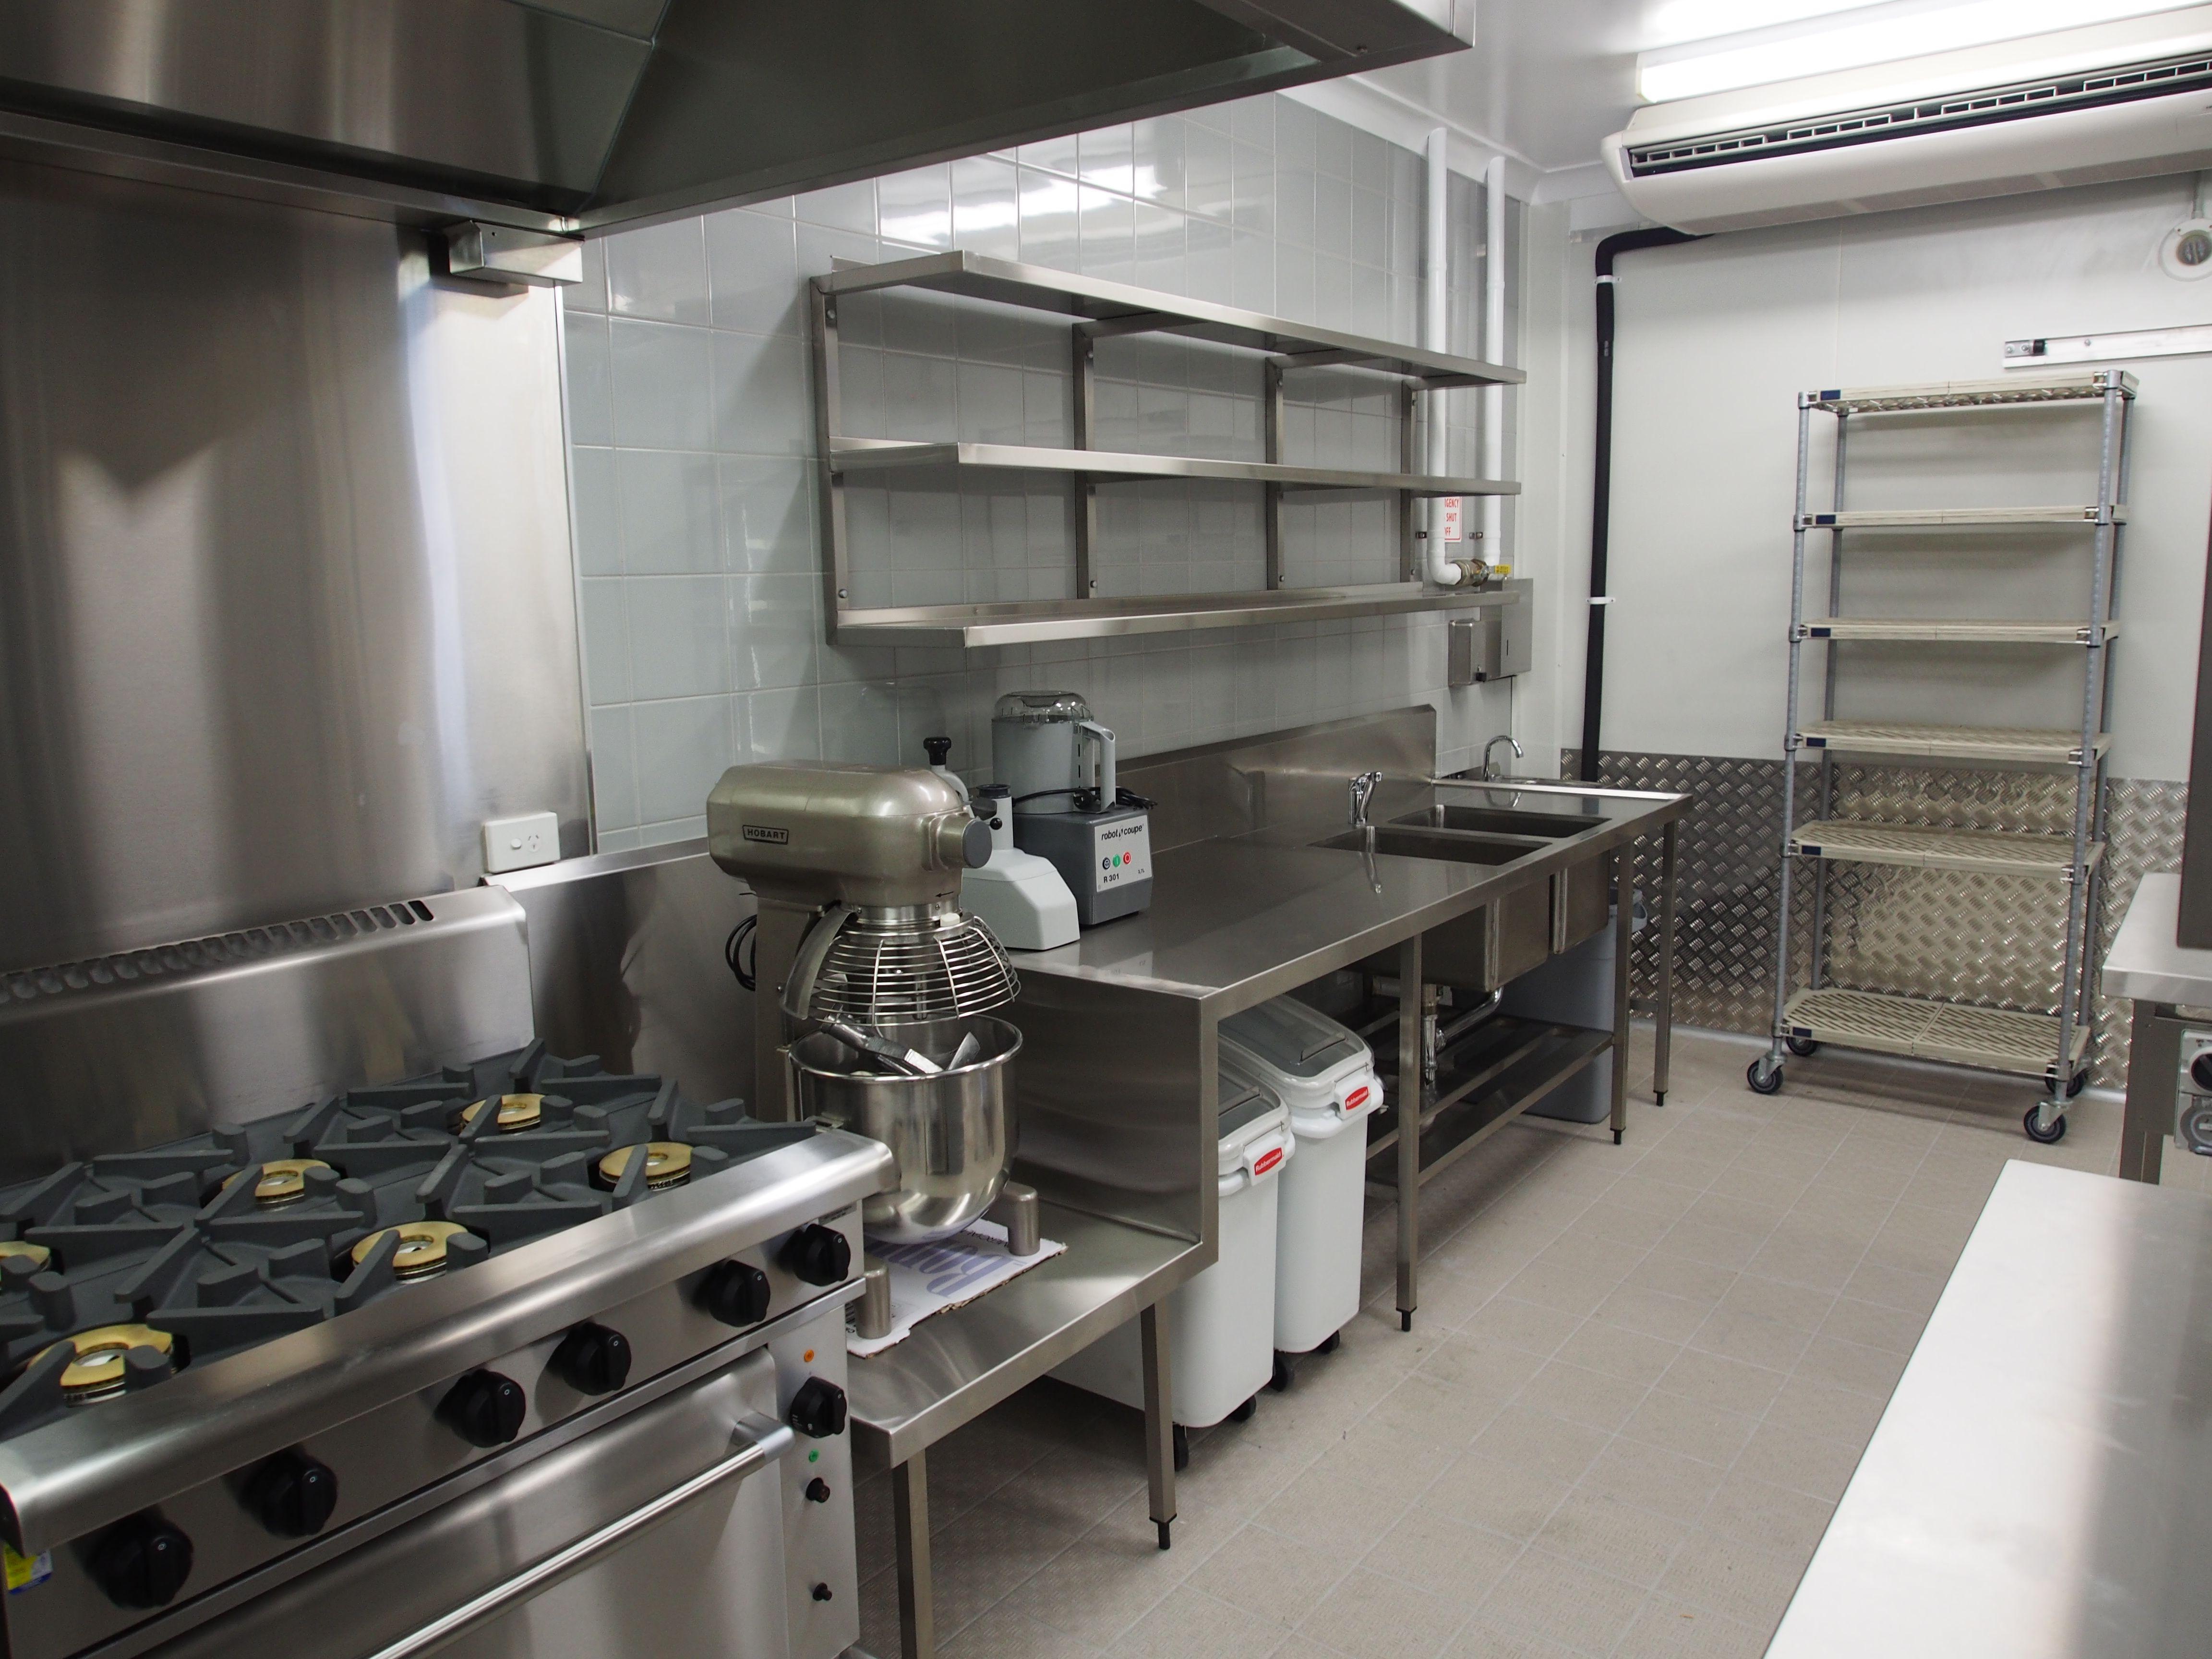 Commercial Kitchen Cairns Kitchen Commercial Kitchen Kitchen Cabinets